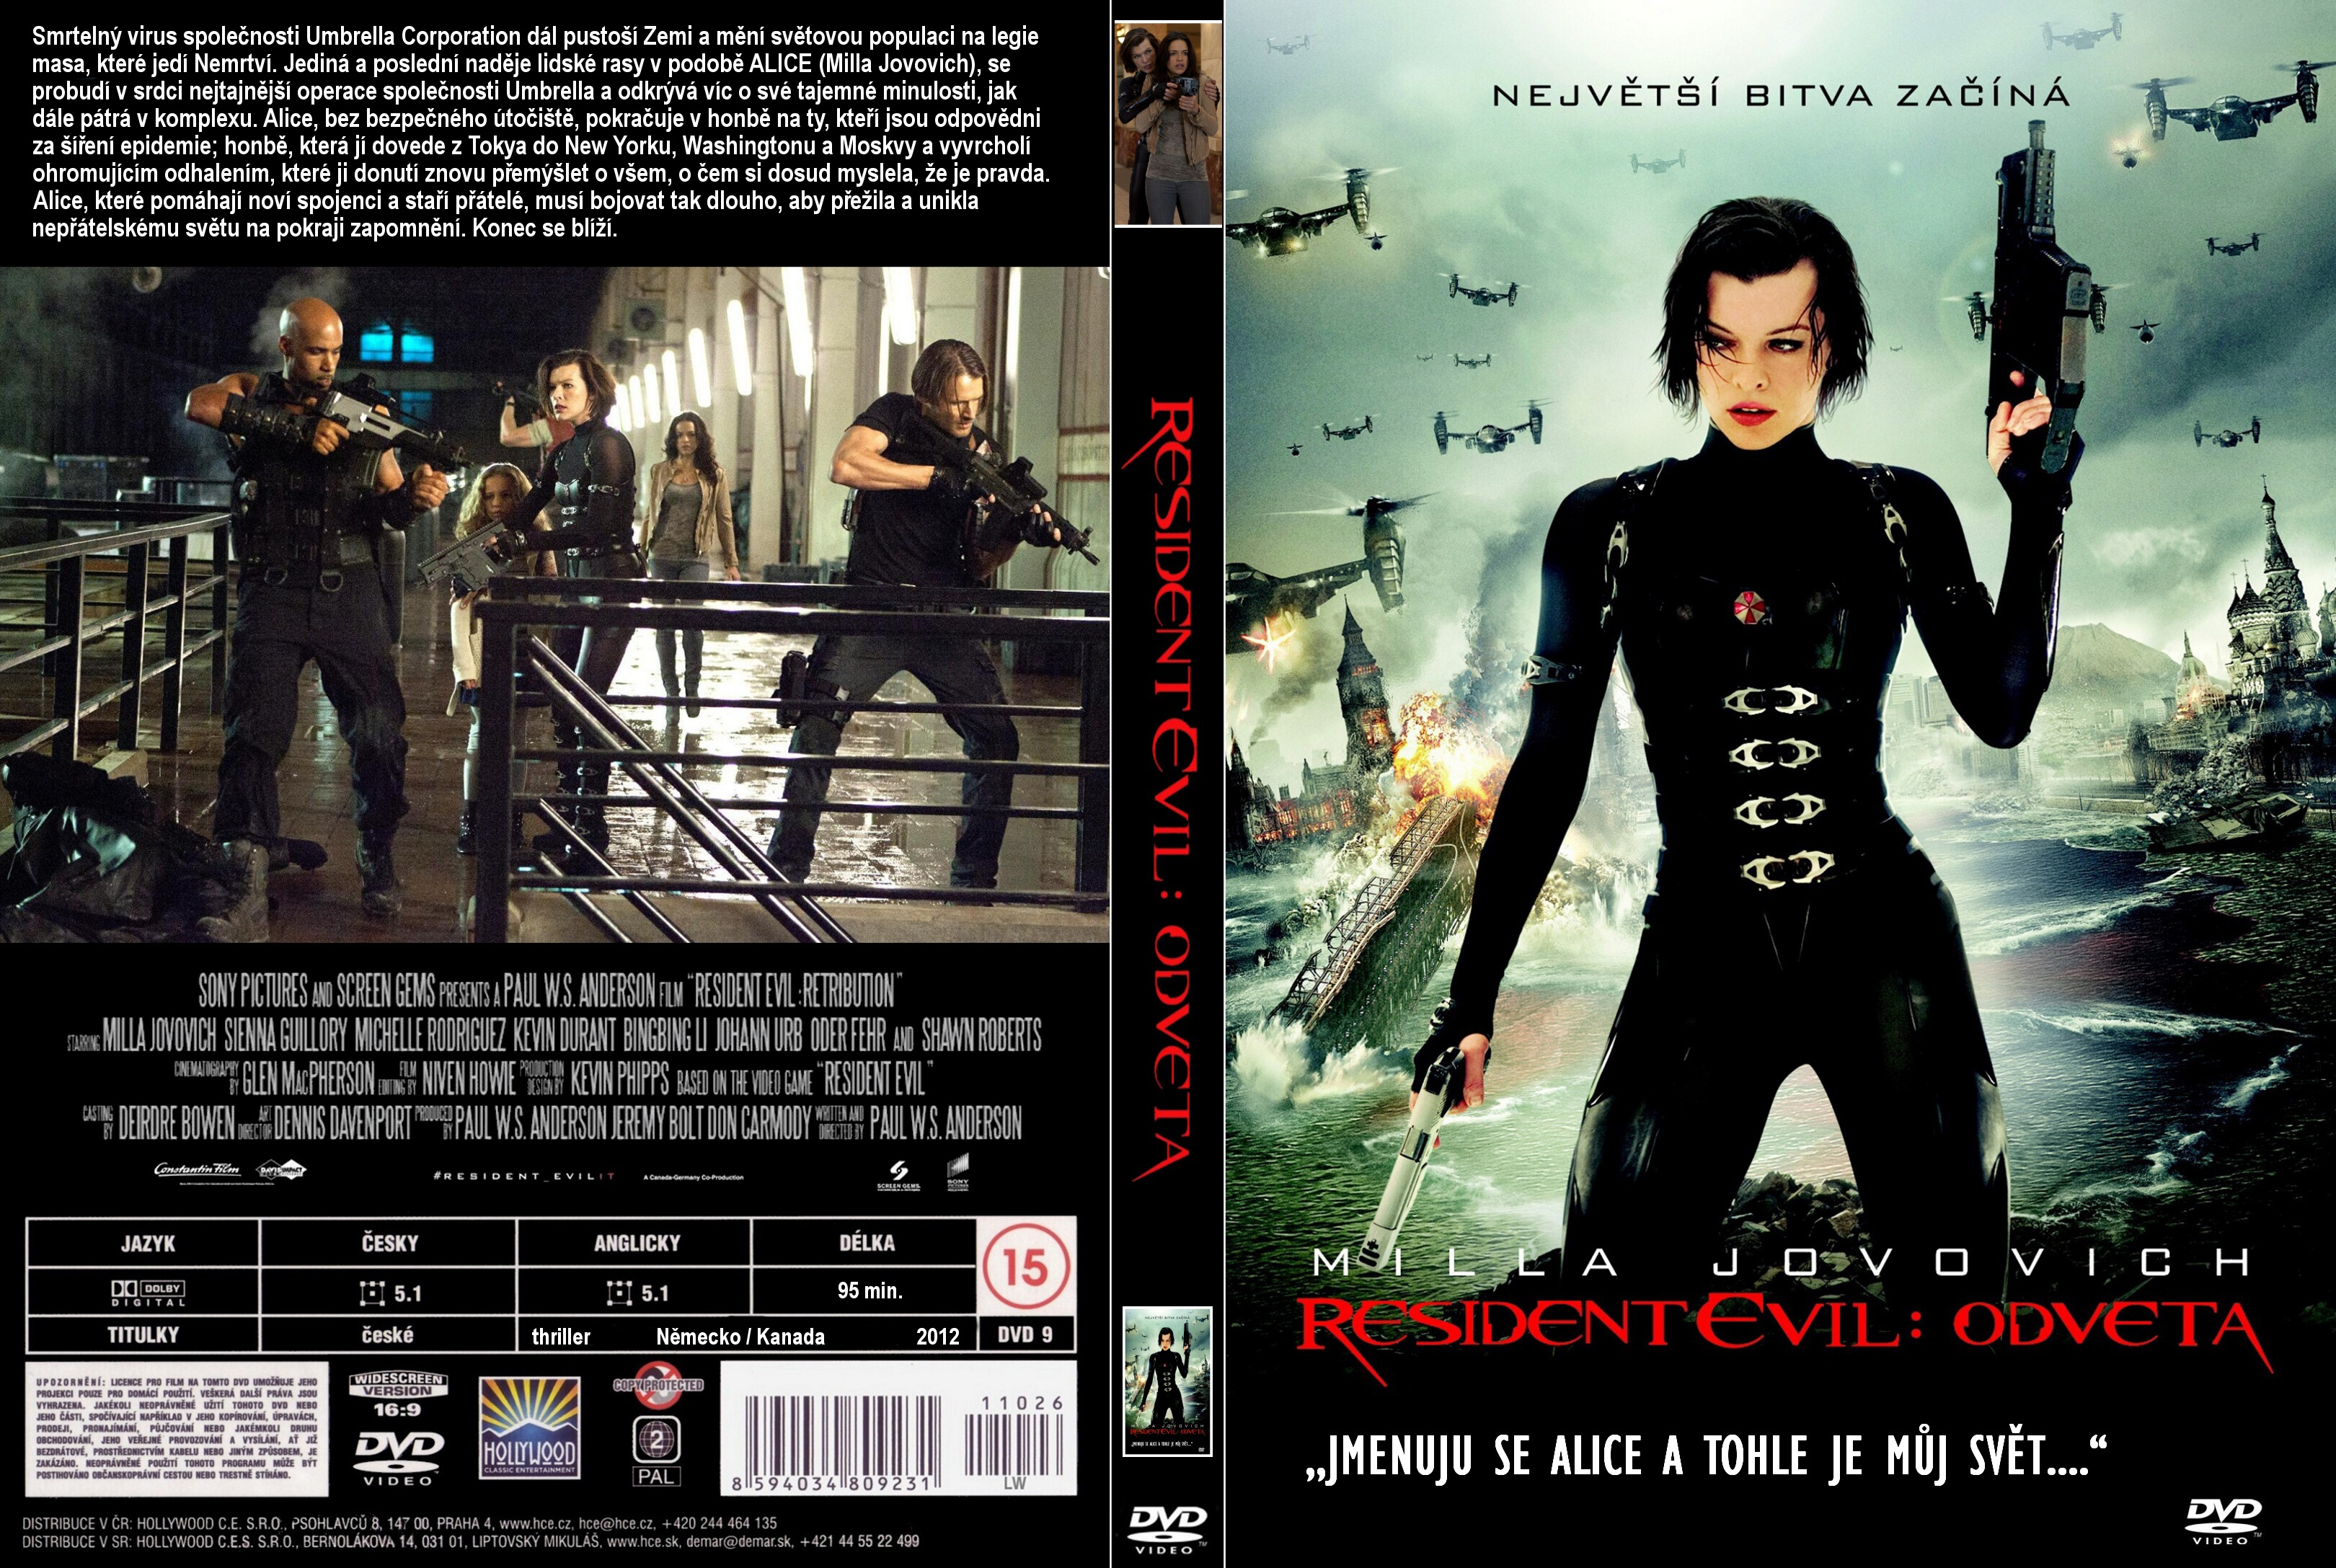 Resident Evil Retribution 2012 Bluray 720p 650mb Movies4u Ar